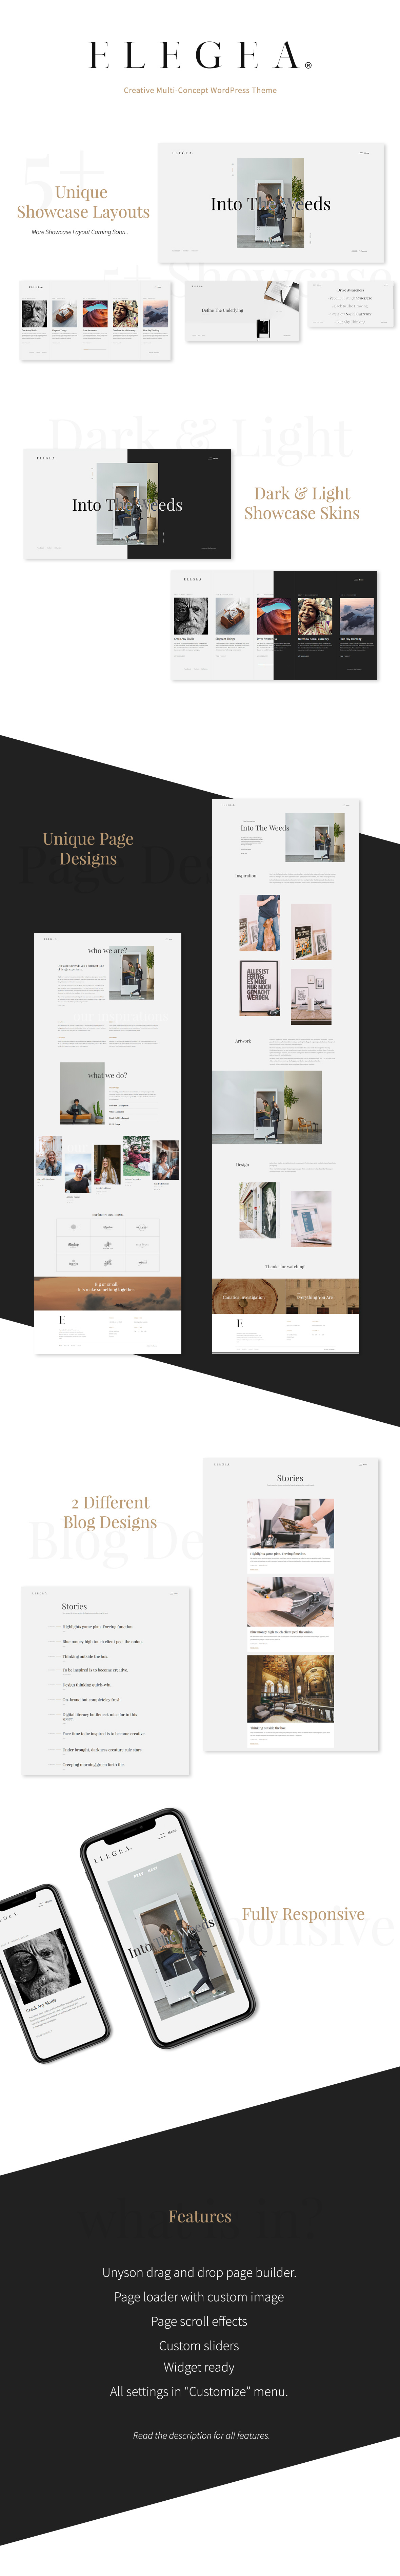 Elegea - Thème WordPress multi-concept - 2